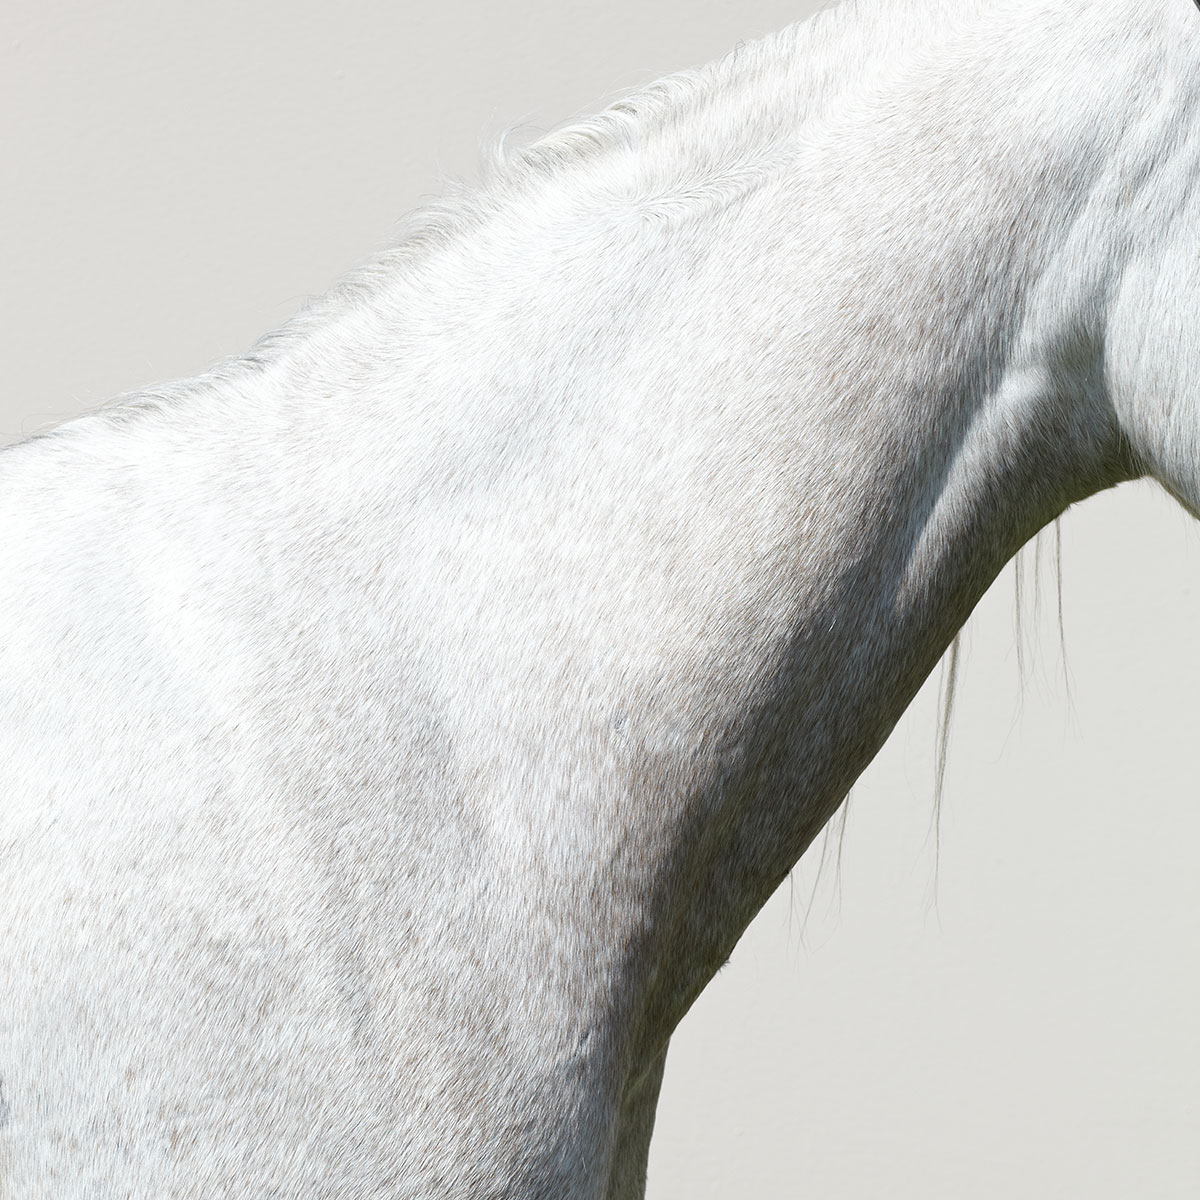 decorative photo with horses